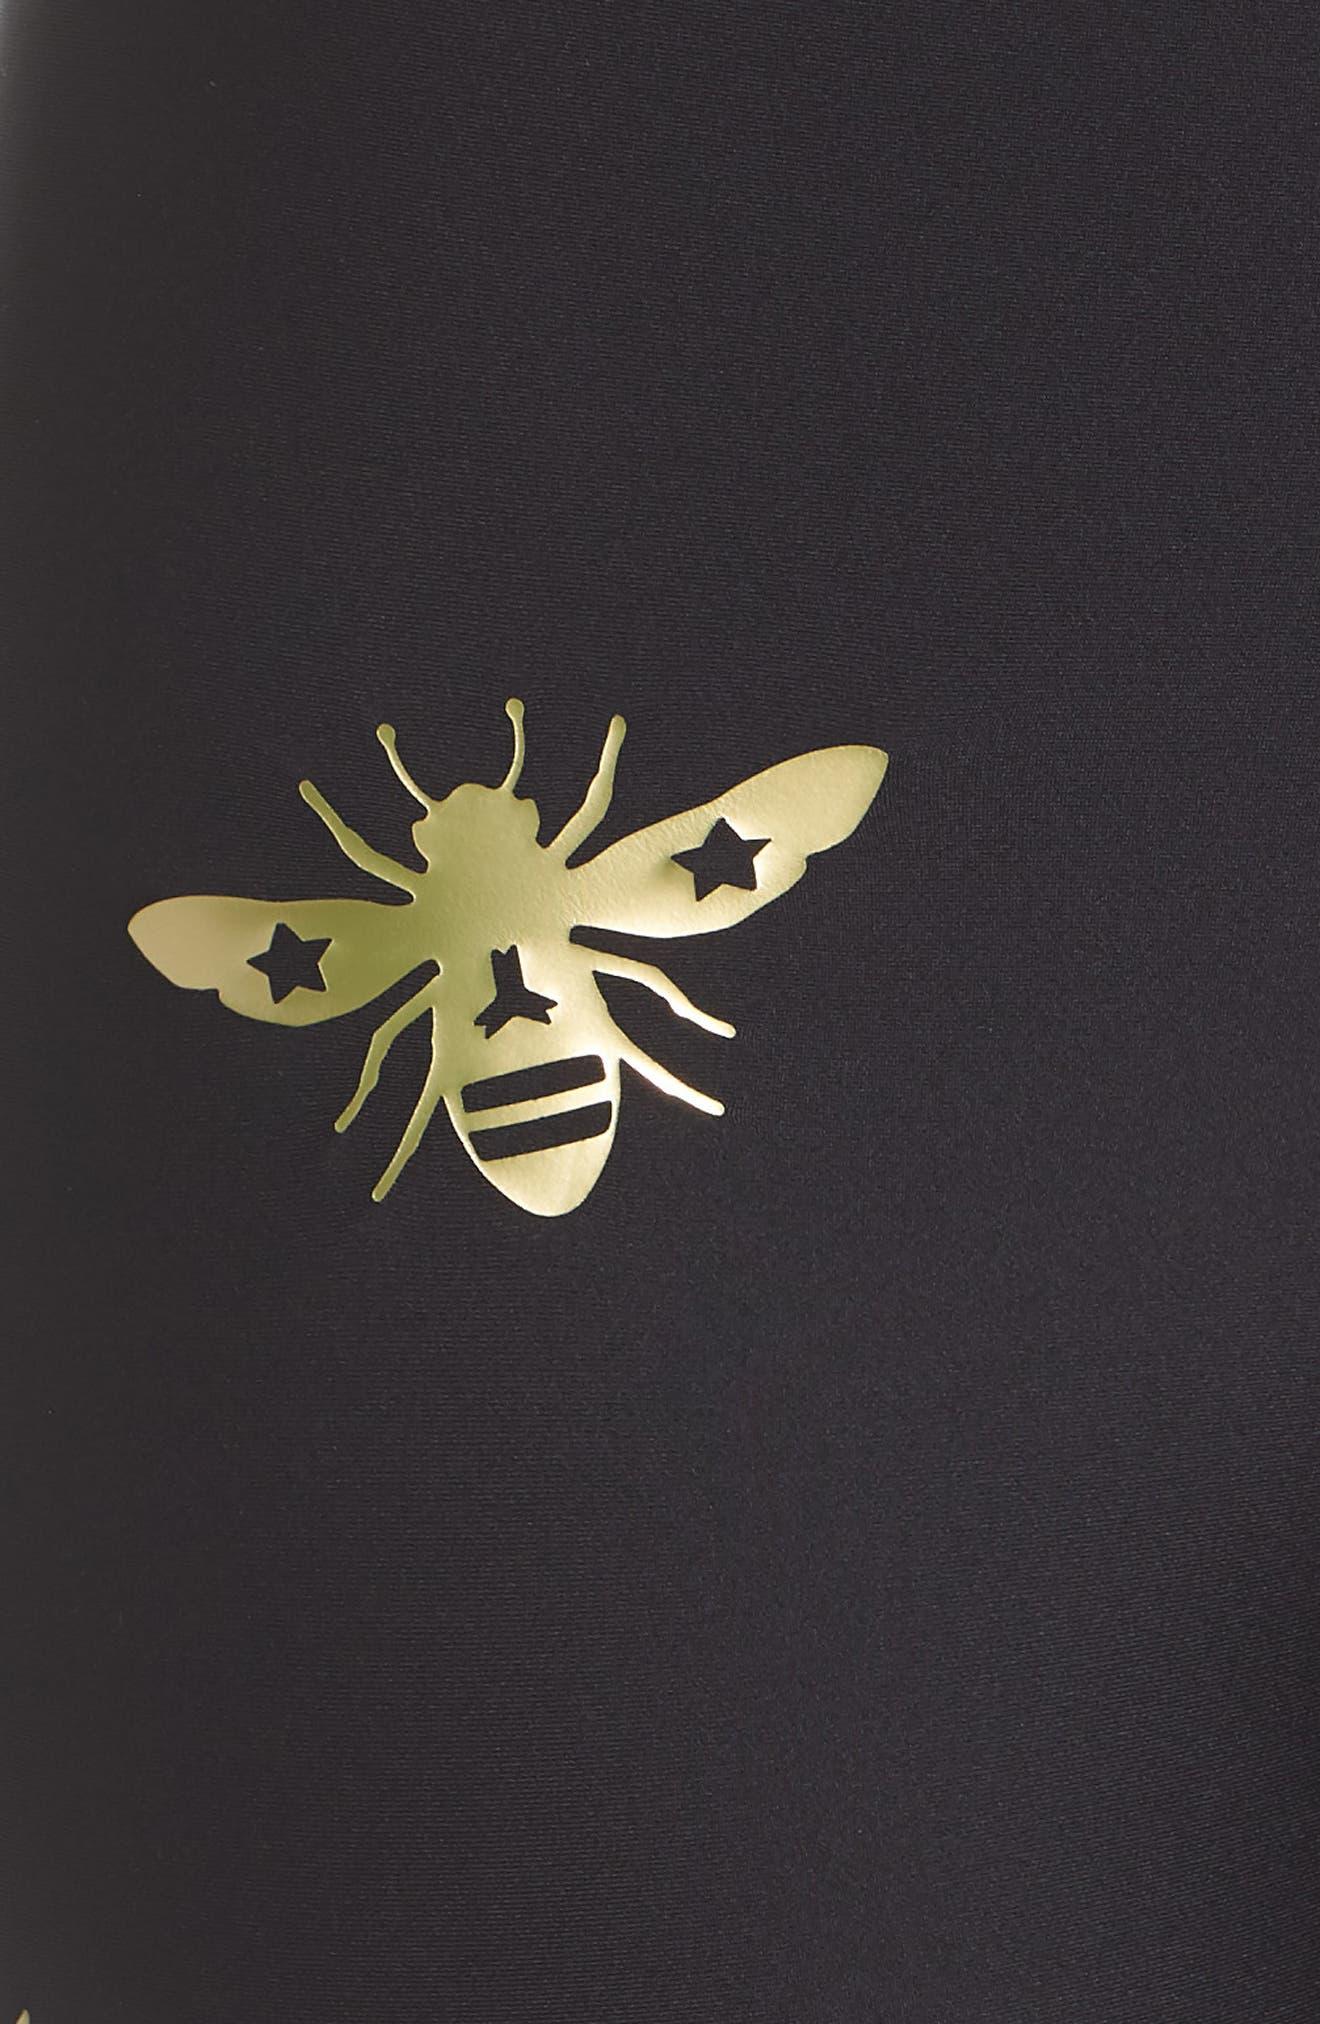 Ultra Bee Leggings,                             Alternate thumbnail 6, color,                             001